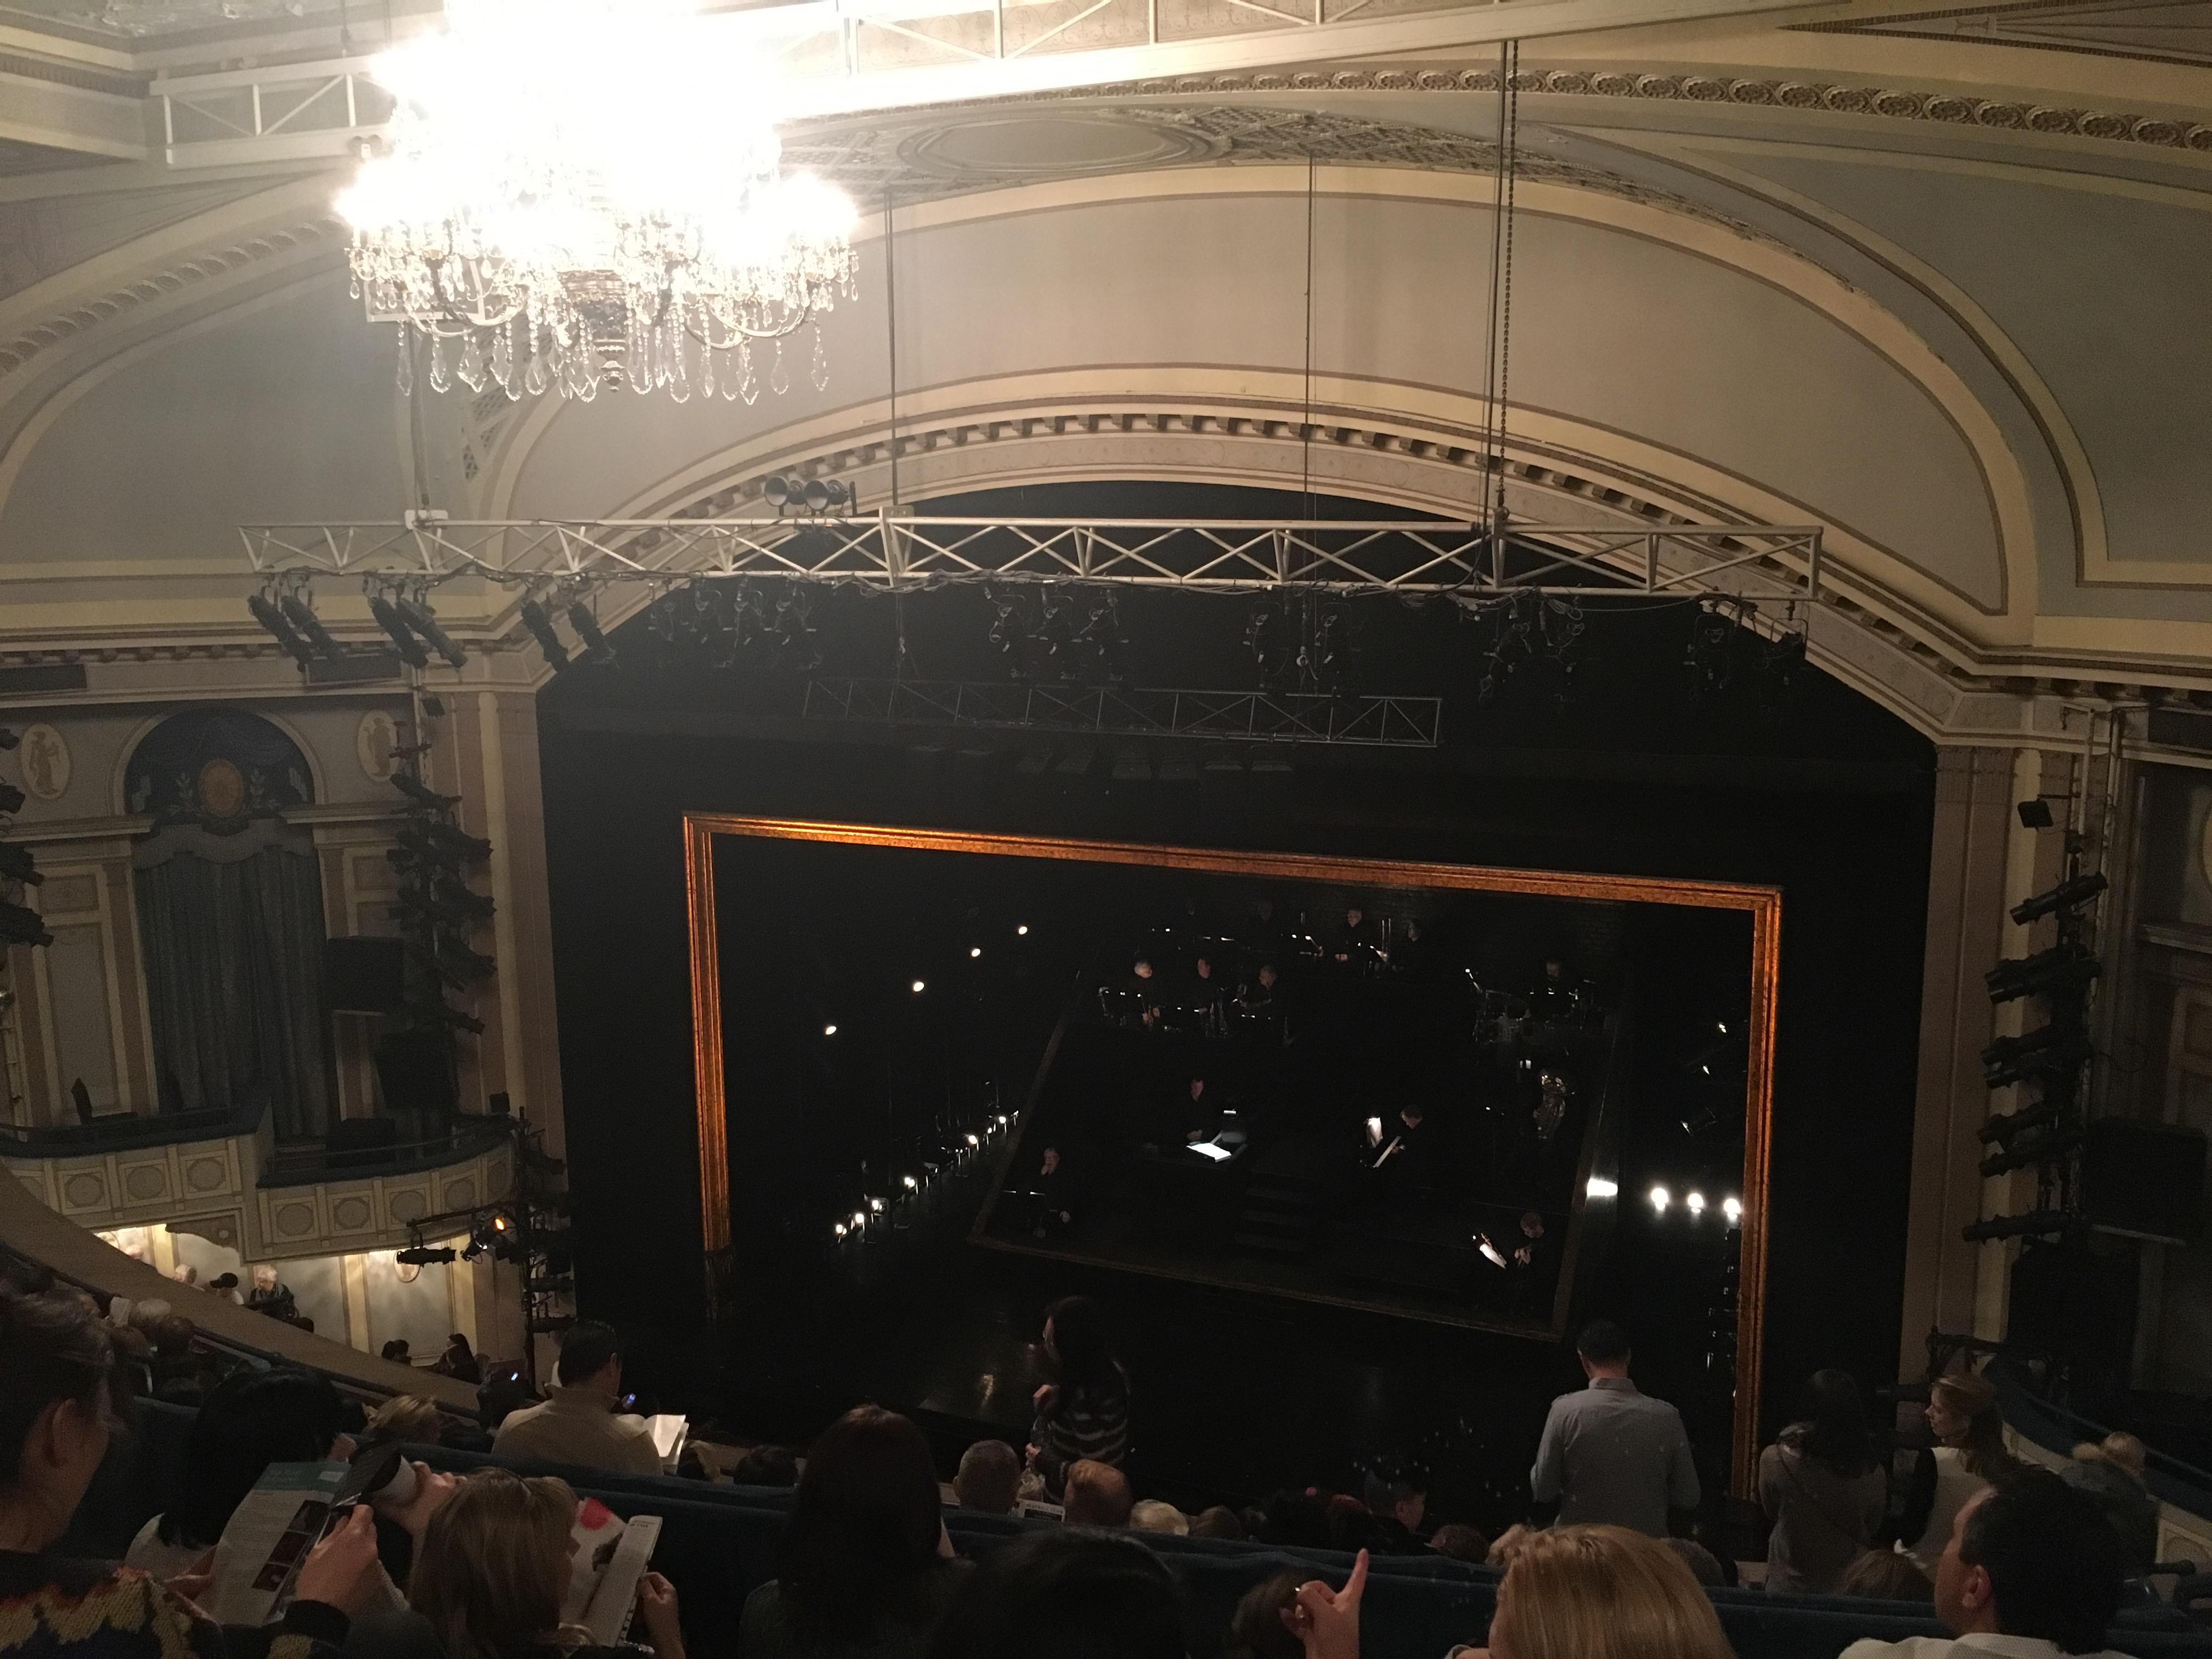 Ambassador Theatre Section Rear Mezzanine Row D Seat 8